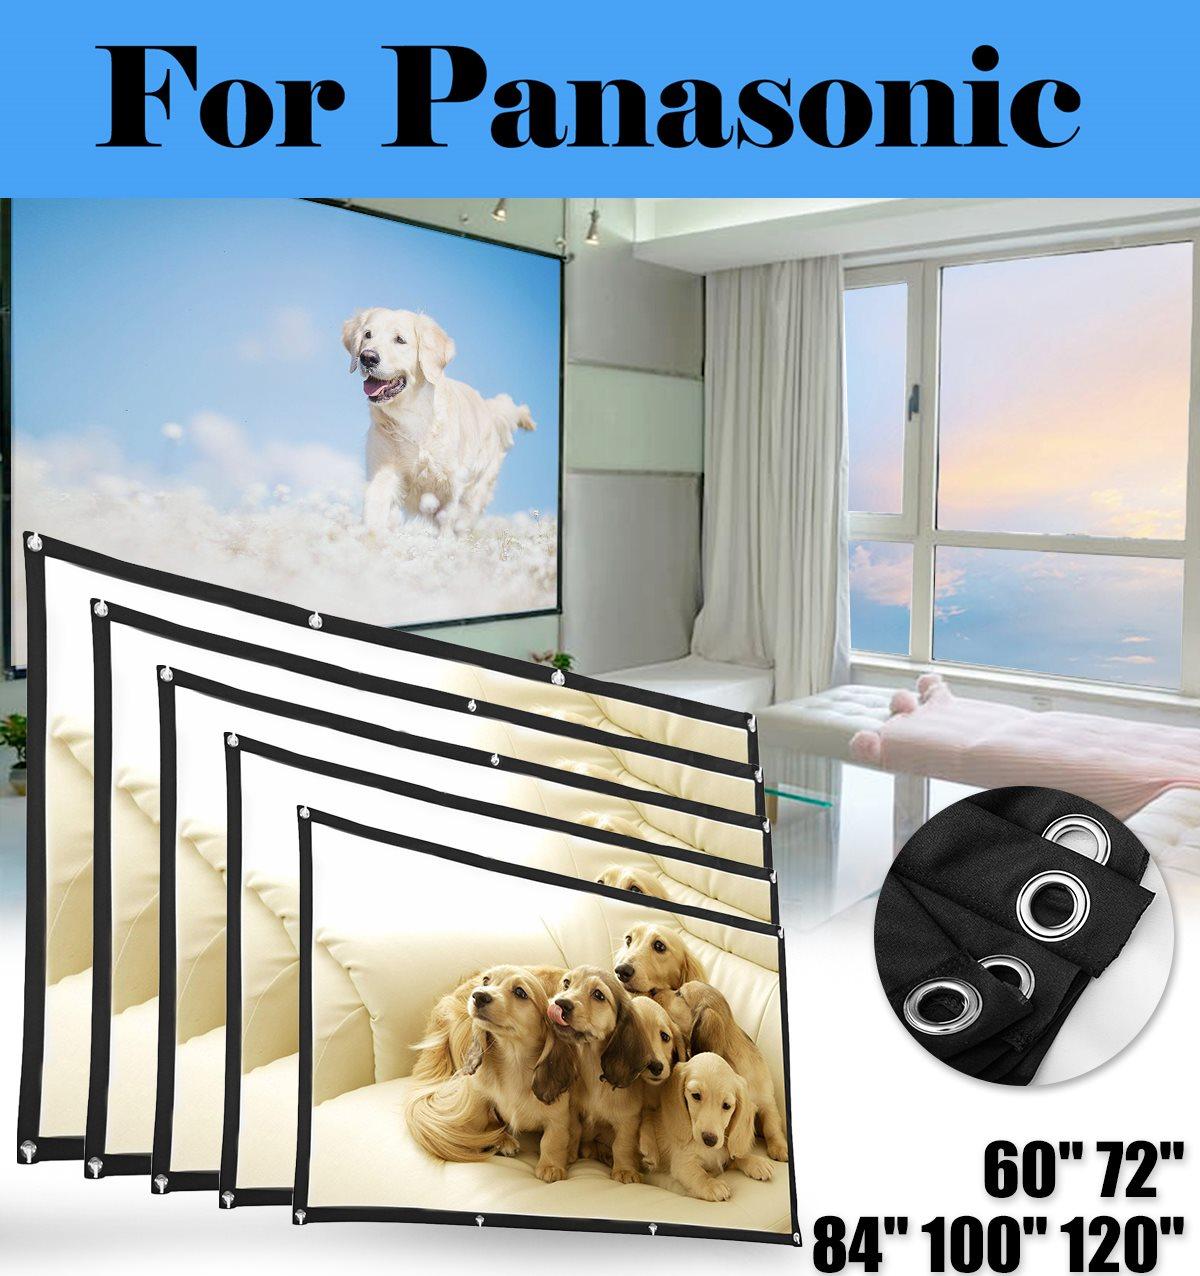 Portátil HD 120 pulgadas 43 plegable de fibra de pantalla de proyección para Panasonic PT-RZ570U PT-RZ570WU PT-RZ575U PT-RZ660BU